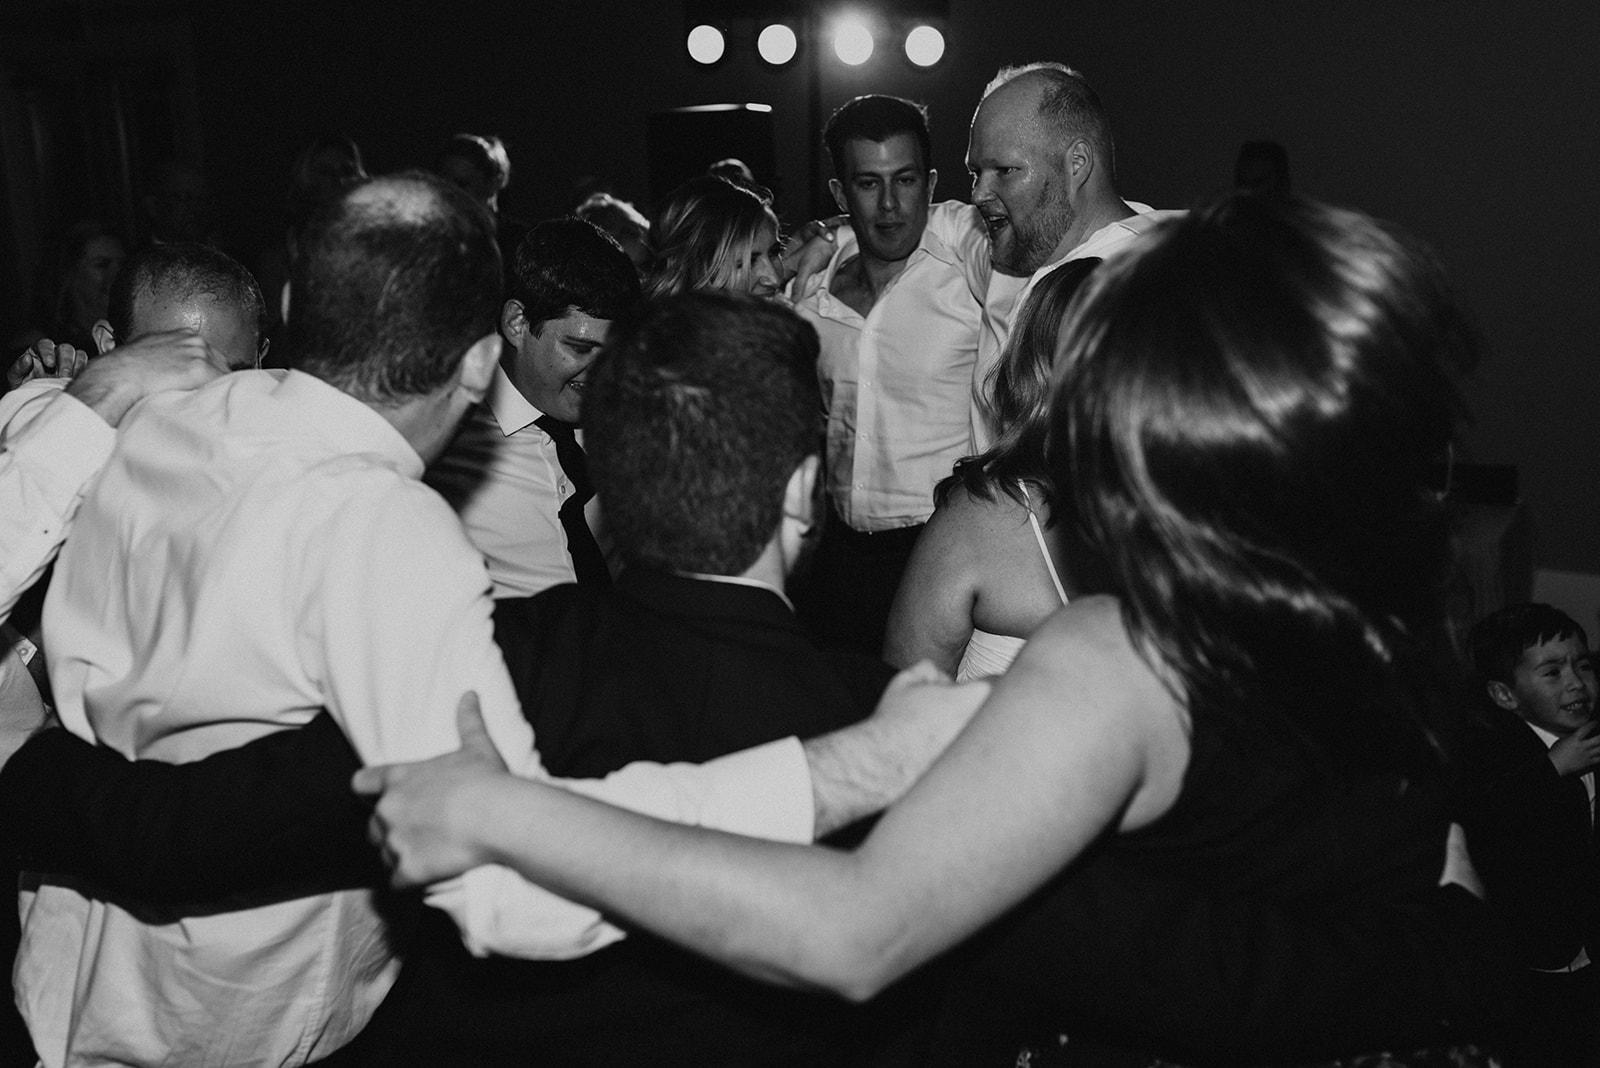 wedding hora dances